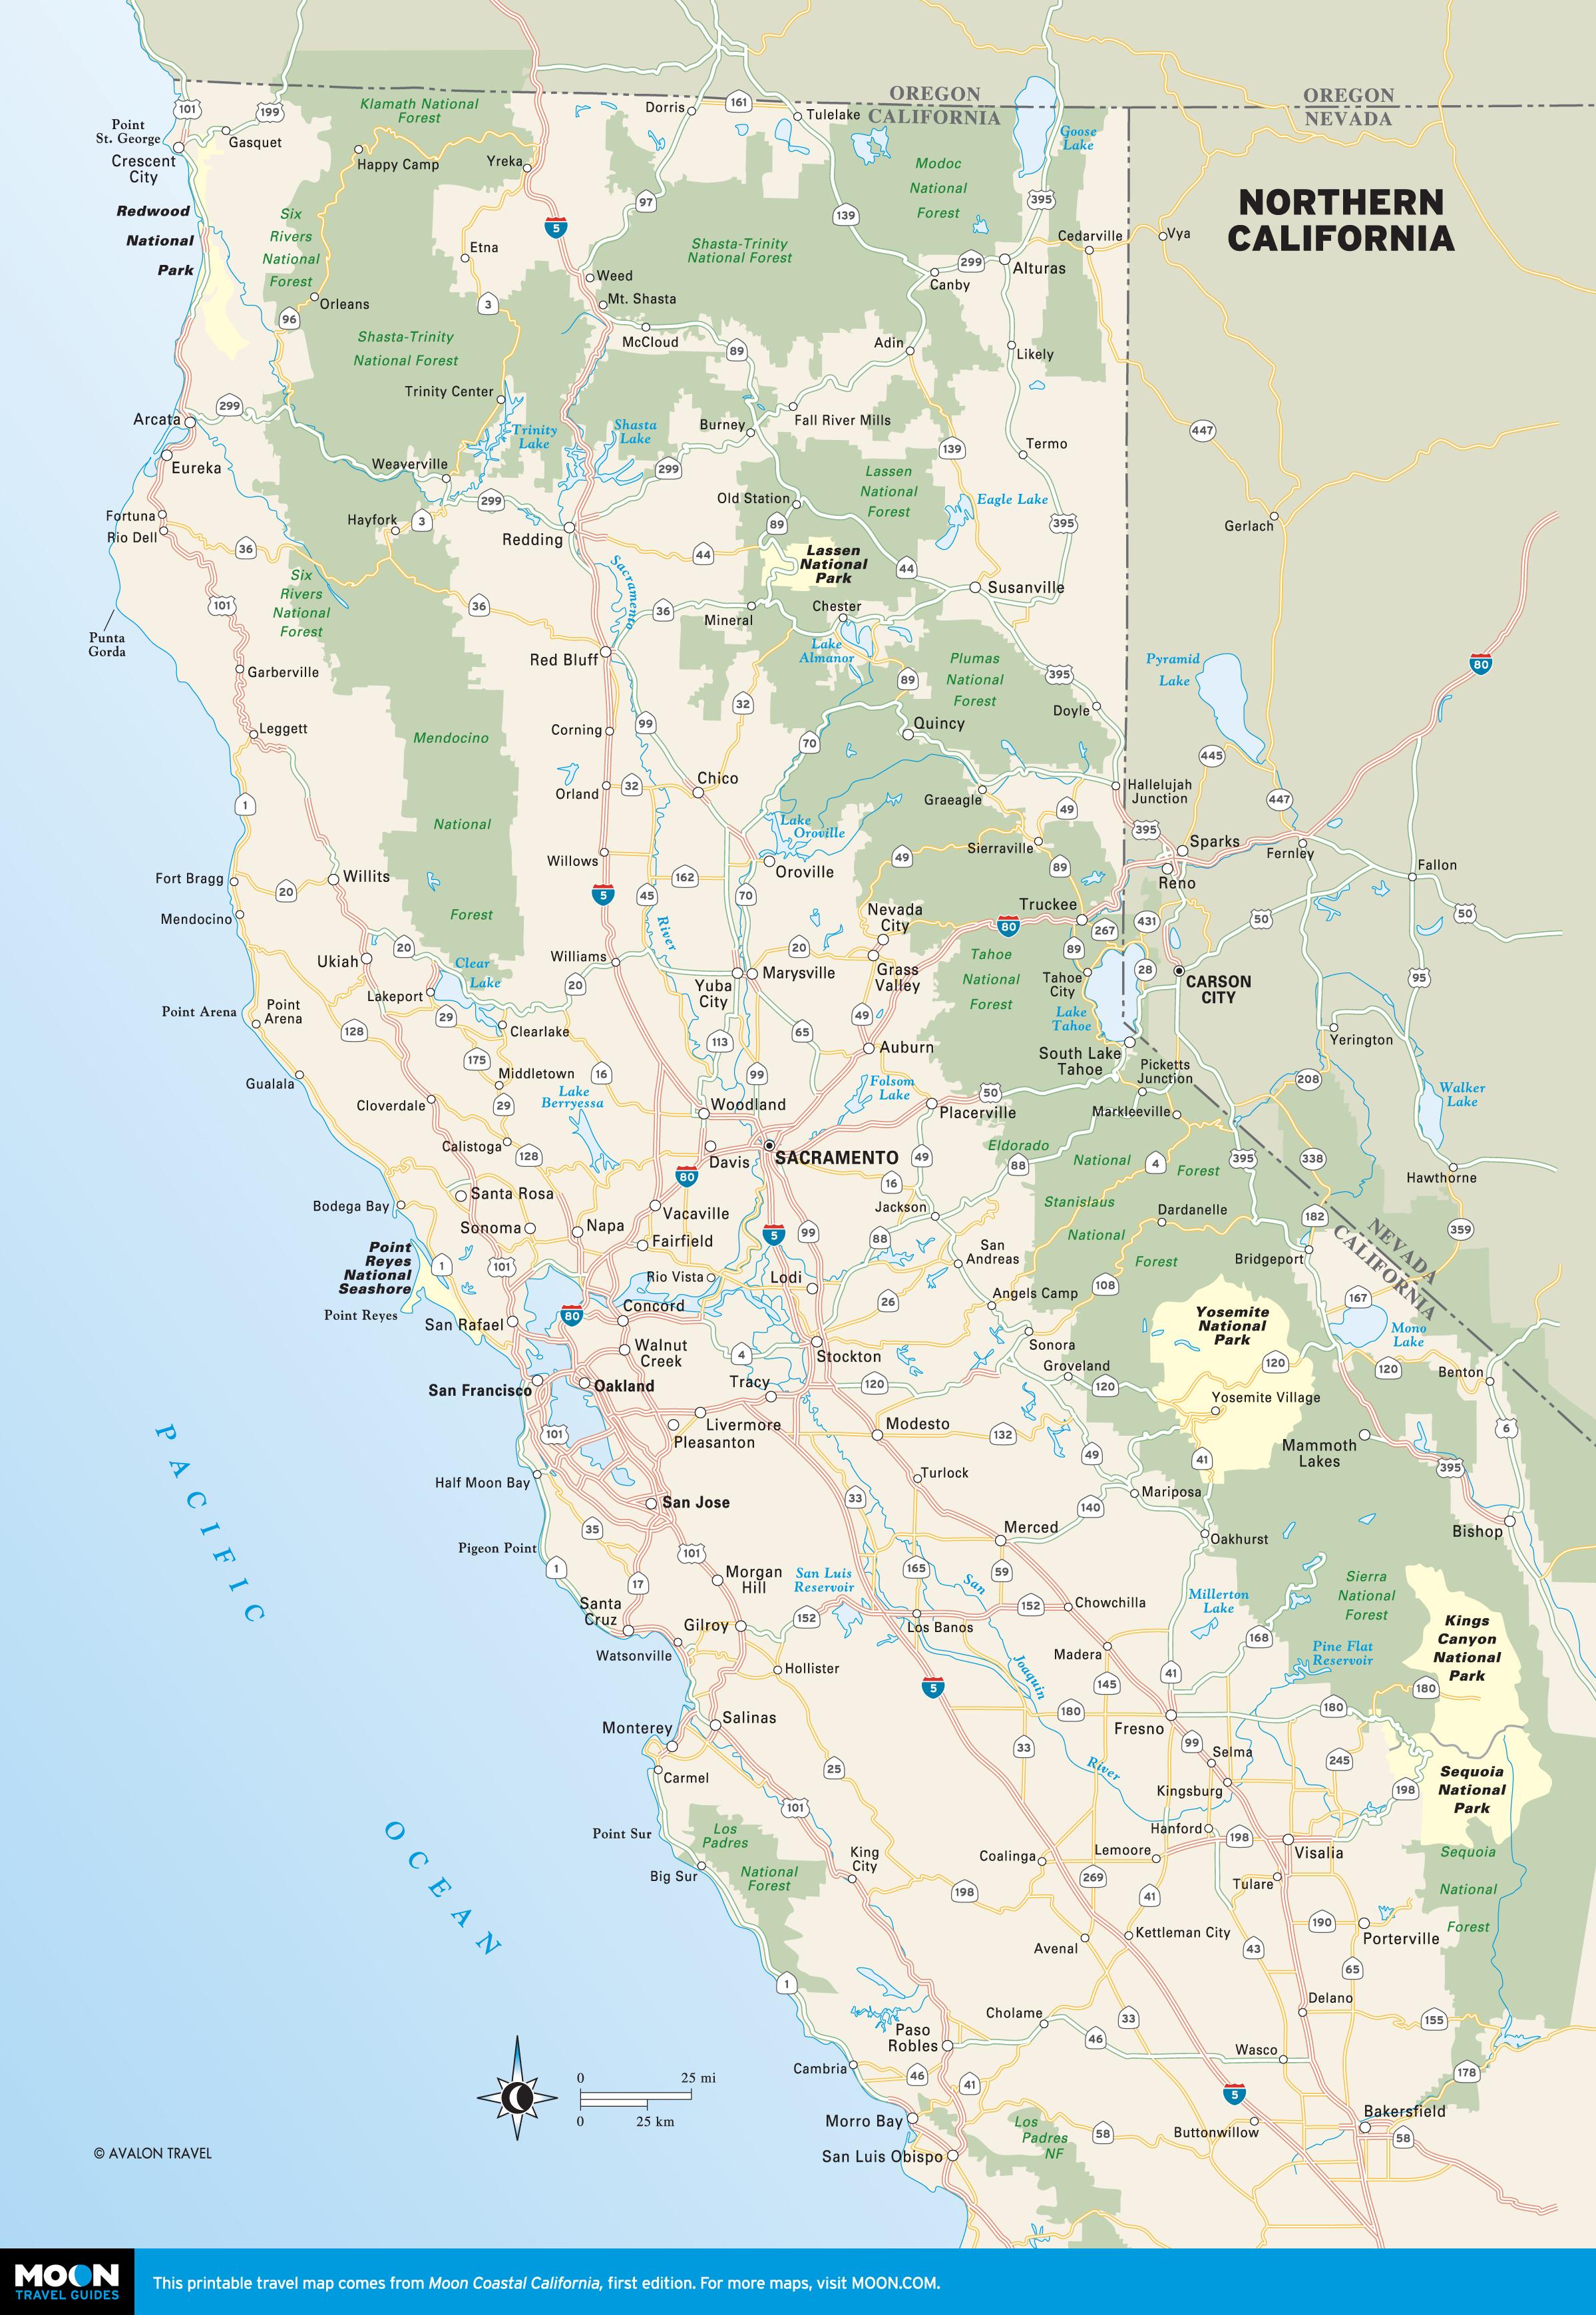 Printable Travel Maps Of California Moon Guides At Map Coast - Touran - Printable Road Trip Maps